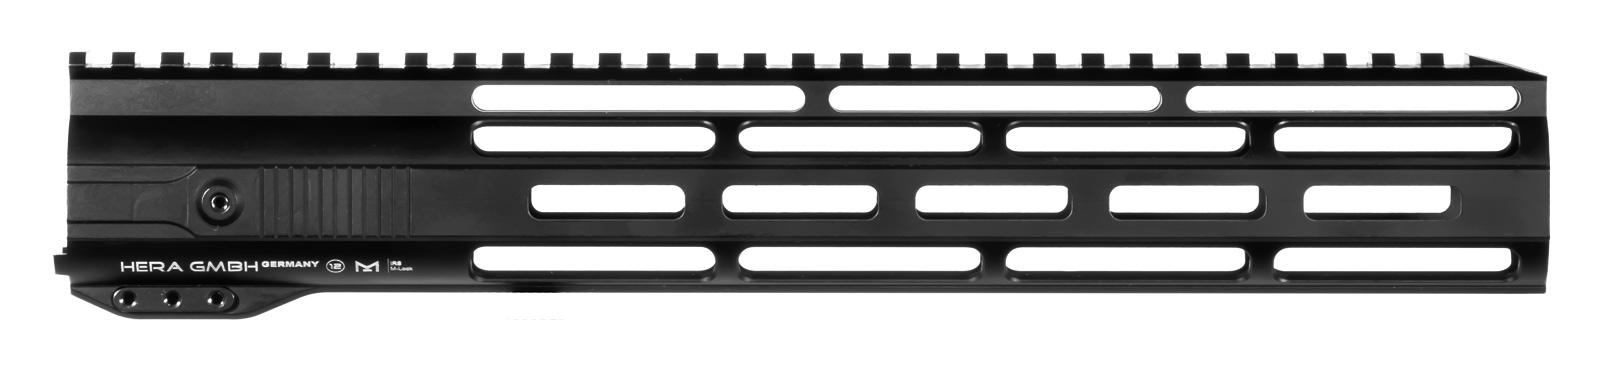 ar-15-rail-12-hera-arms-m-lock-ar-15-handguard-rail